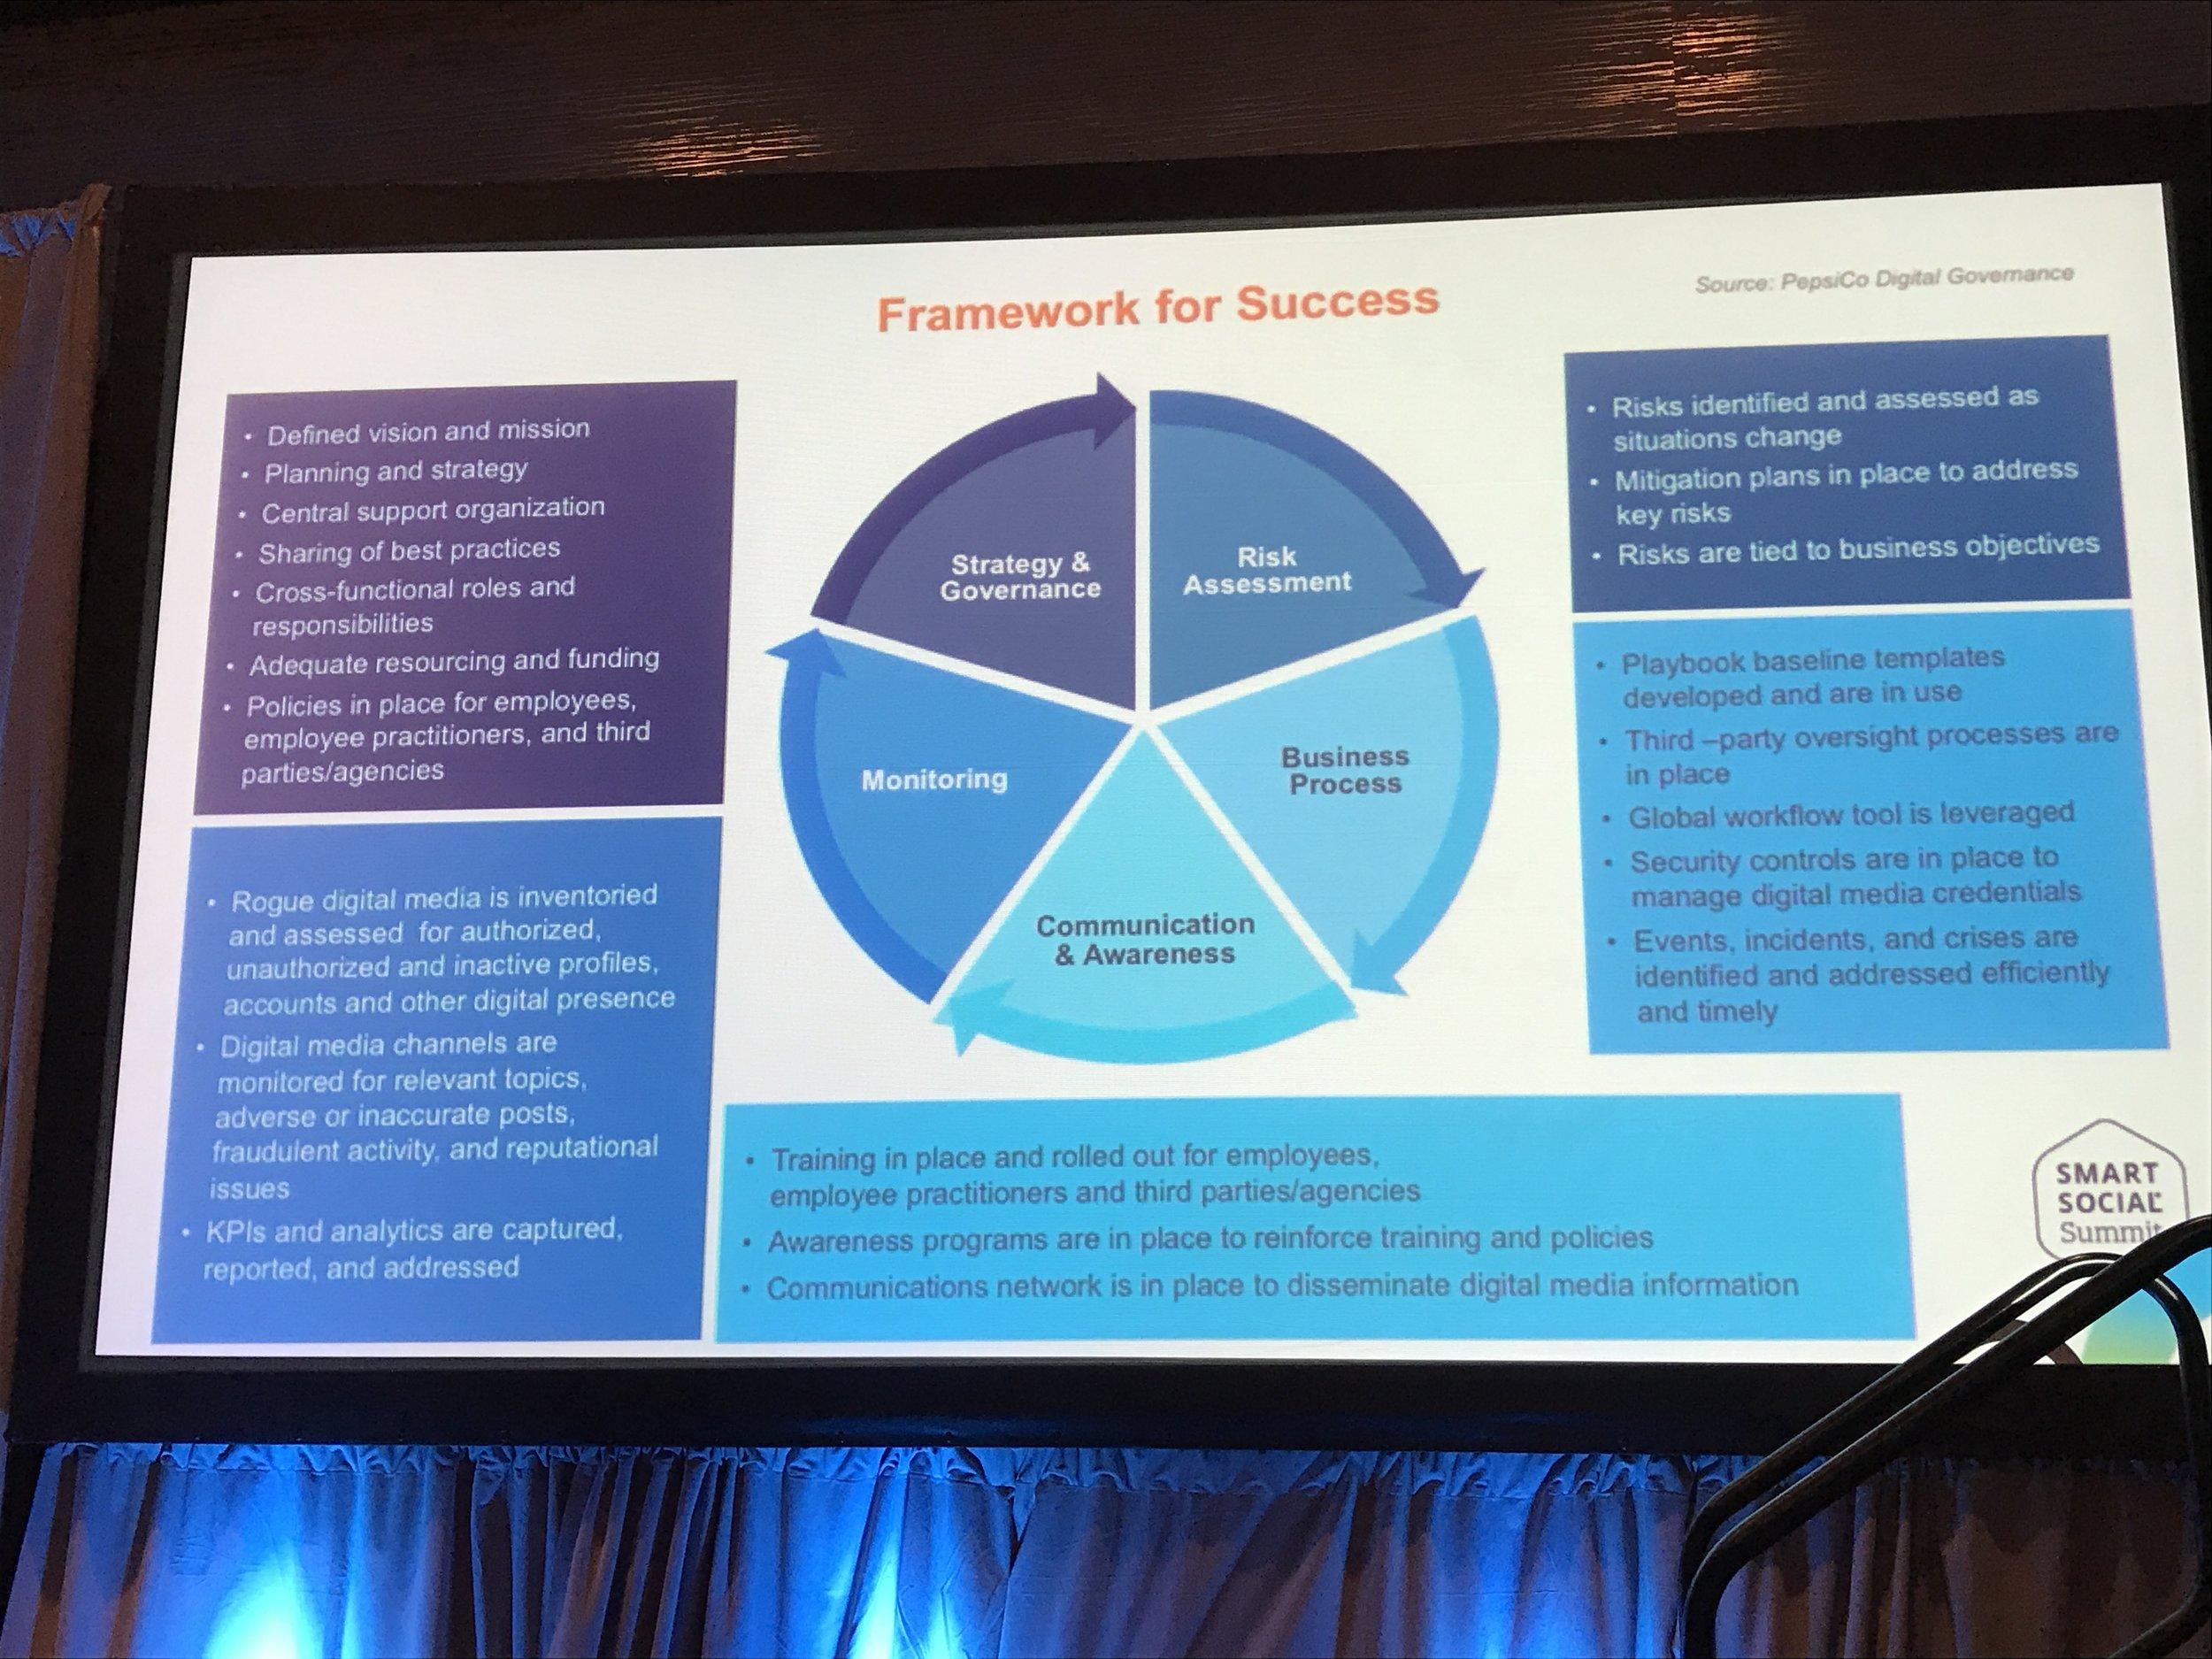 PepsiCo's framework for digital governance success.